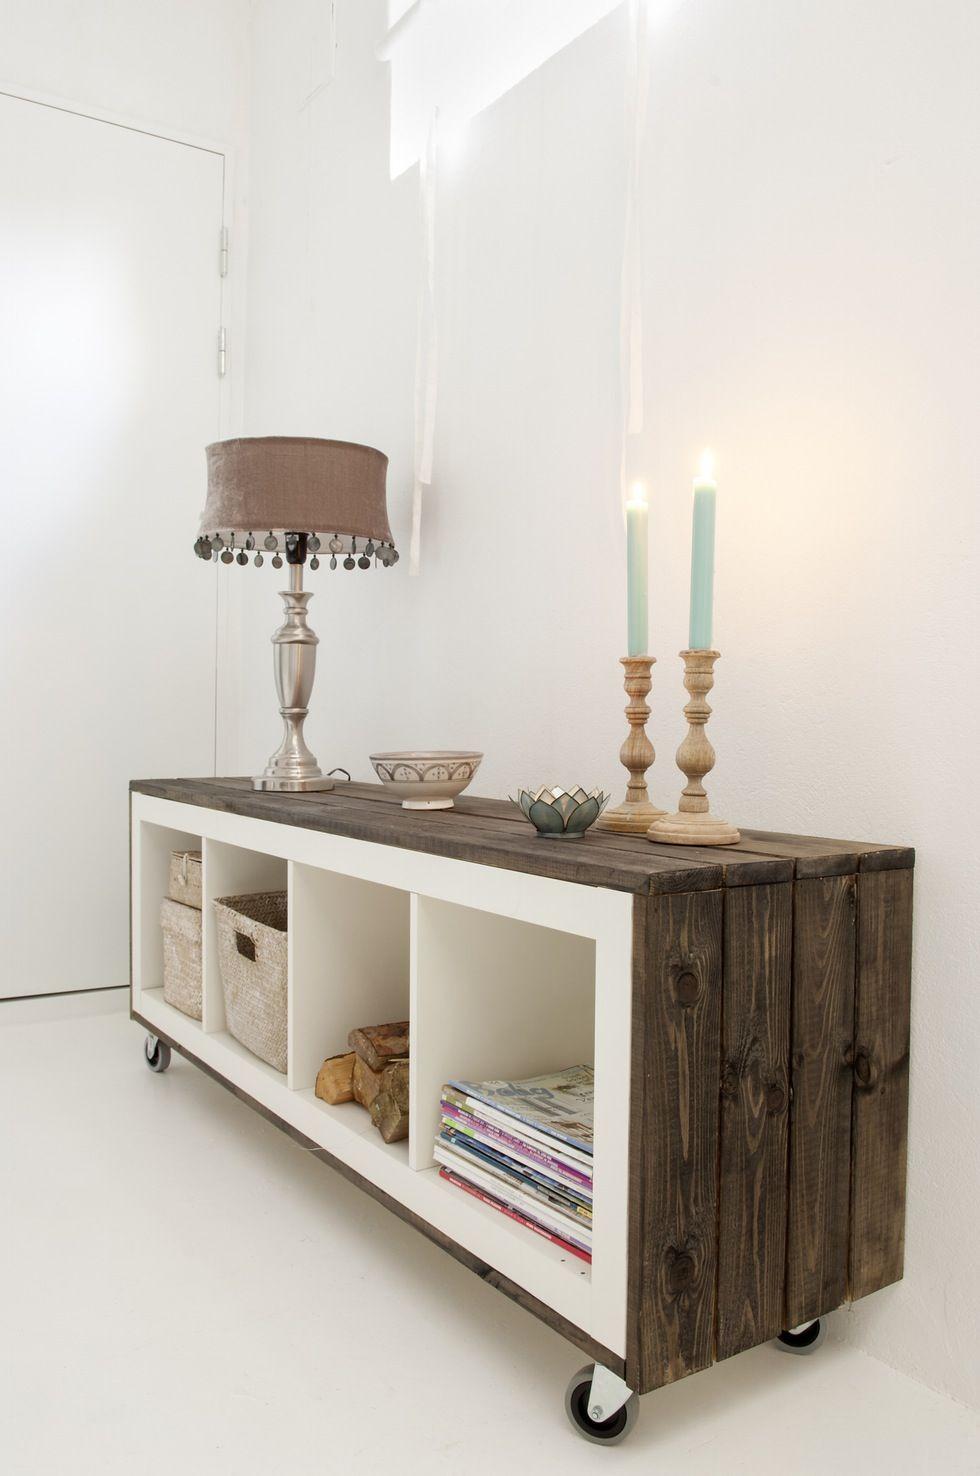 Pimp Up Ikea Furniture Make An Ikea Shelf More Personal By  # Muebles Vestibulo Ikea